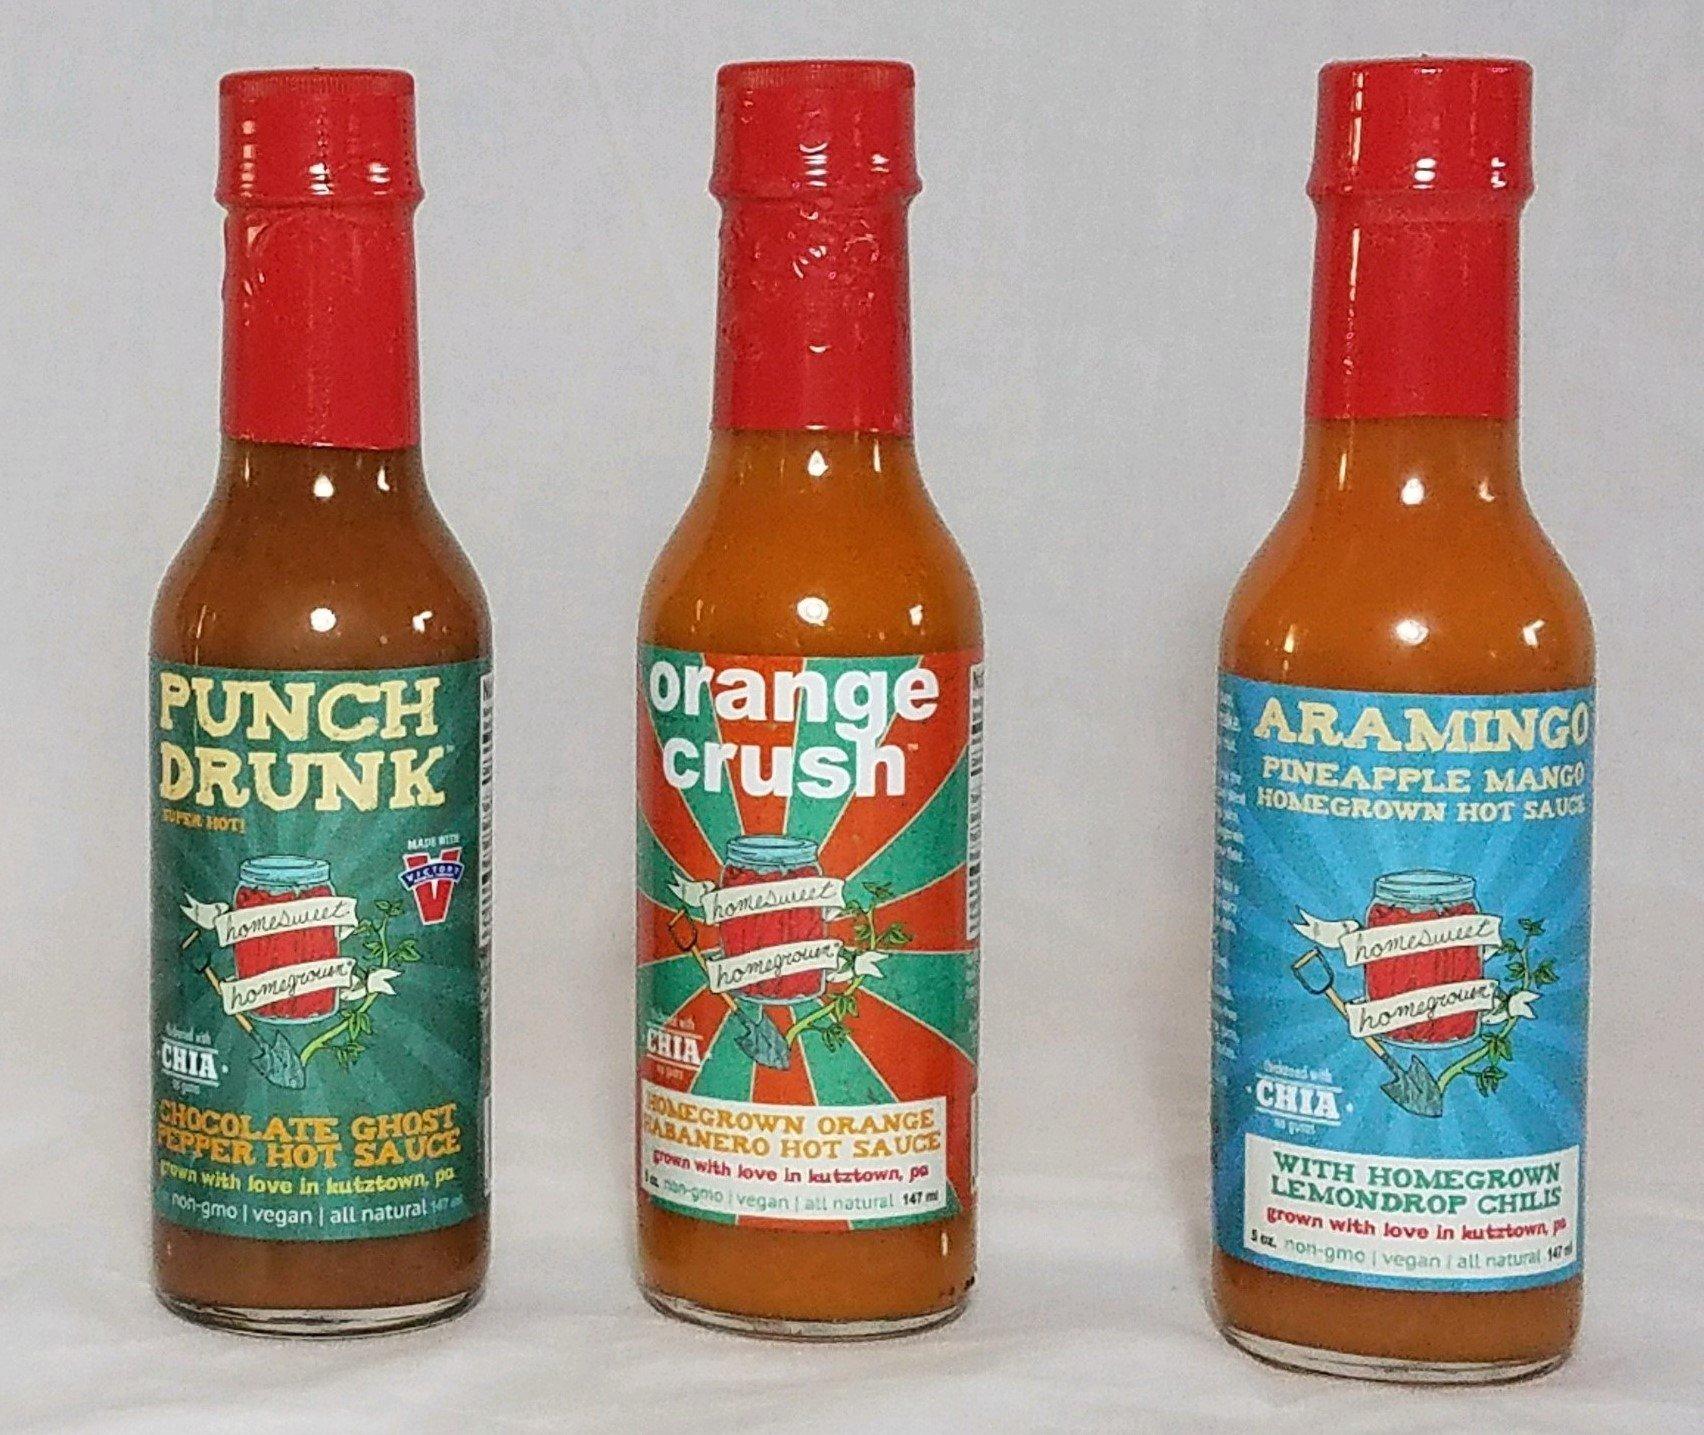 Homesweet Homegrown Vegan Hot Sauce 3 Piece Set - Punch Drunk Chocolate Ghost Pepper Hot Sauce, Orange Crush Habanero Hot Sauce, Aramingo Pineapple Mango Hot Sauce, 5-ounce bottles